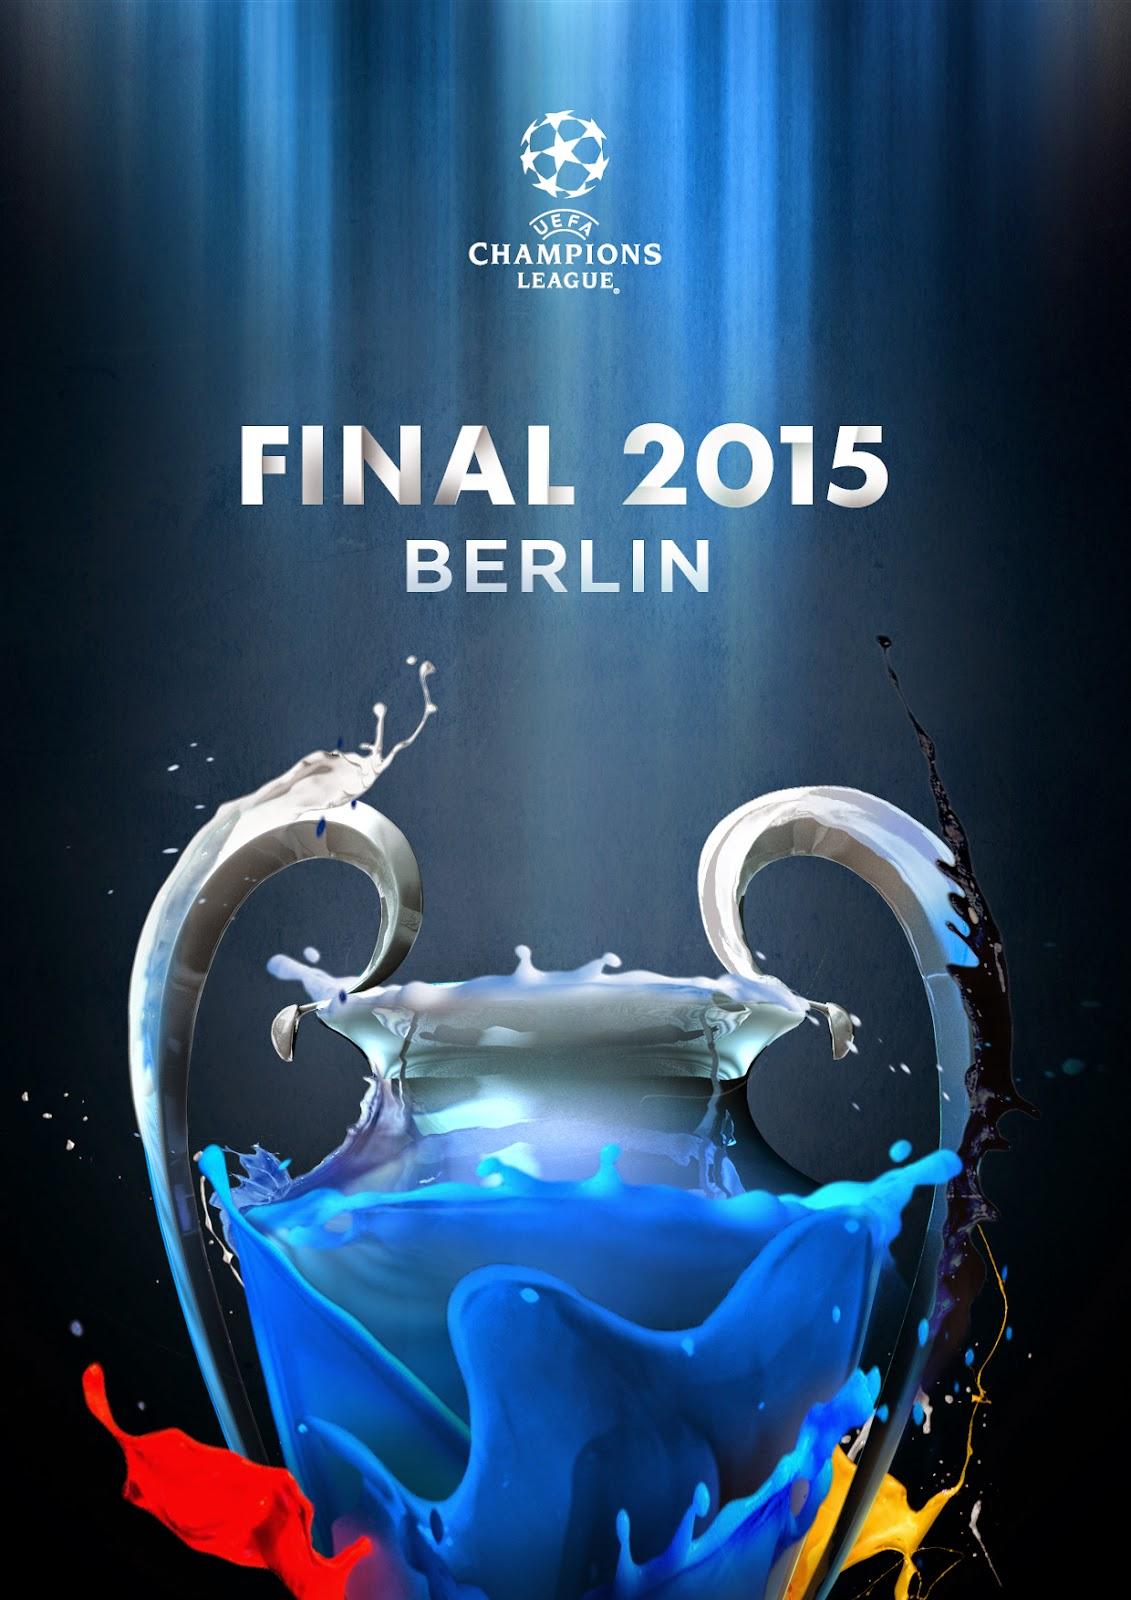 finale champions - photo #25